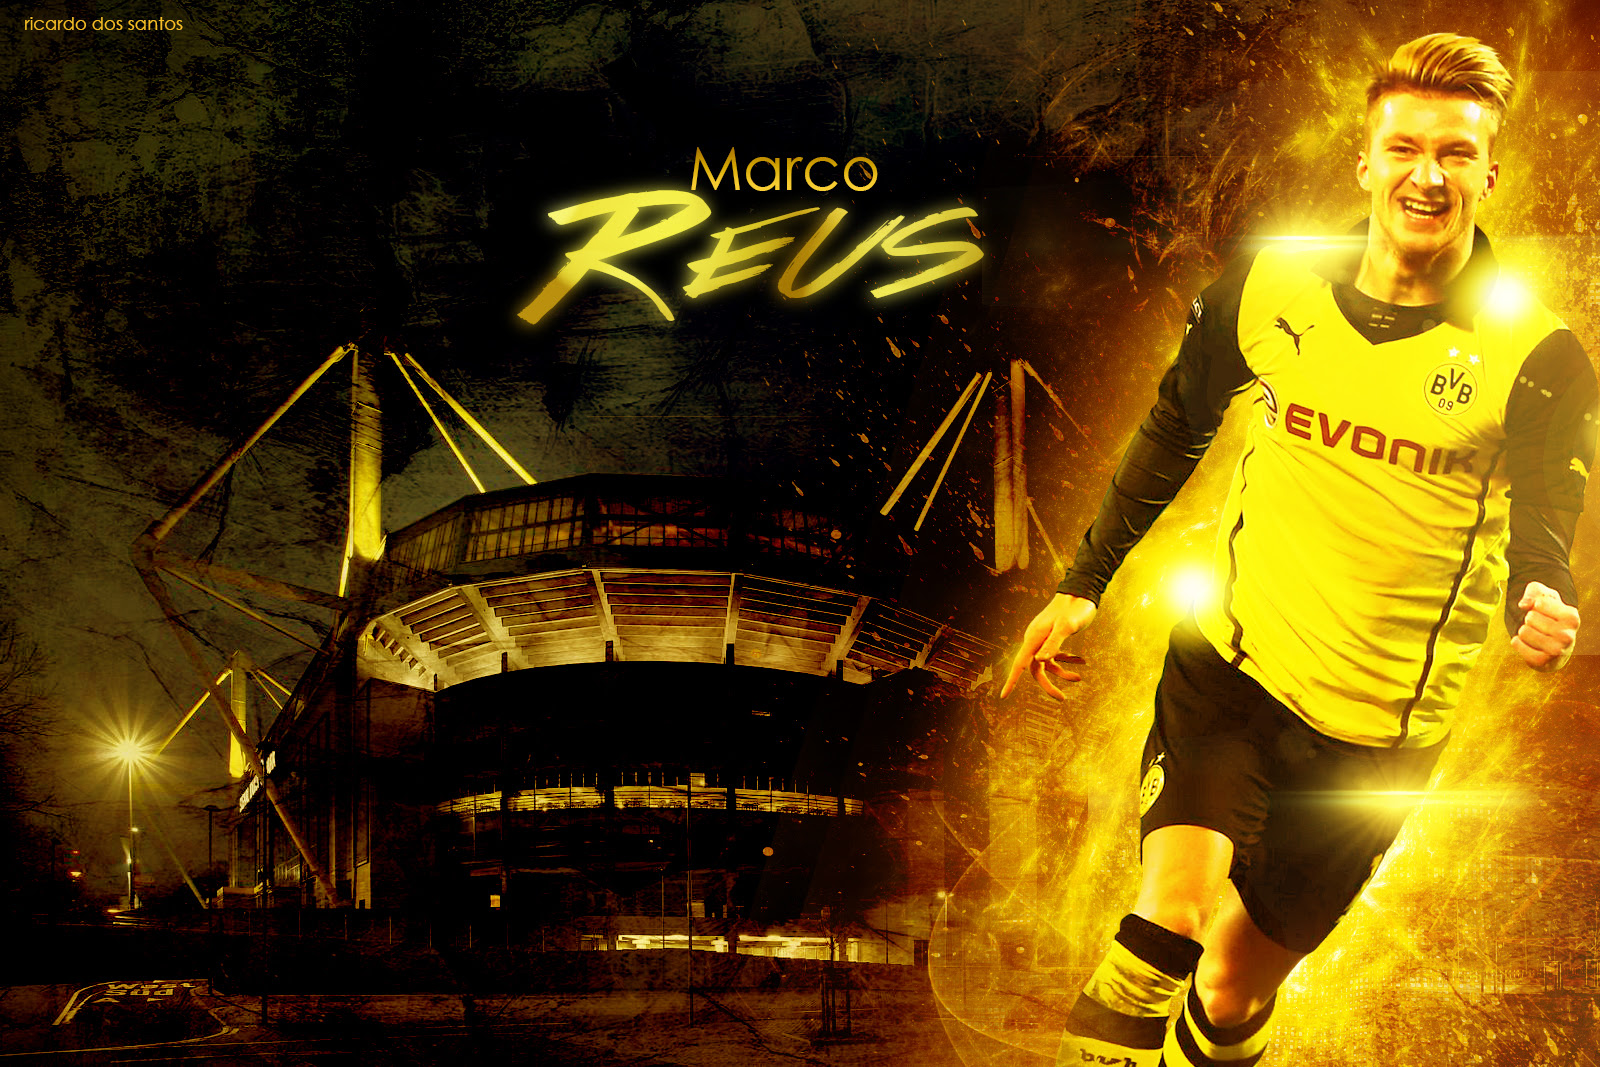 Marco Reus Borussia Dortmund 2014 Wallpaper by RakaGFX on ...